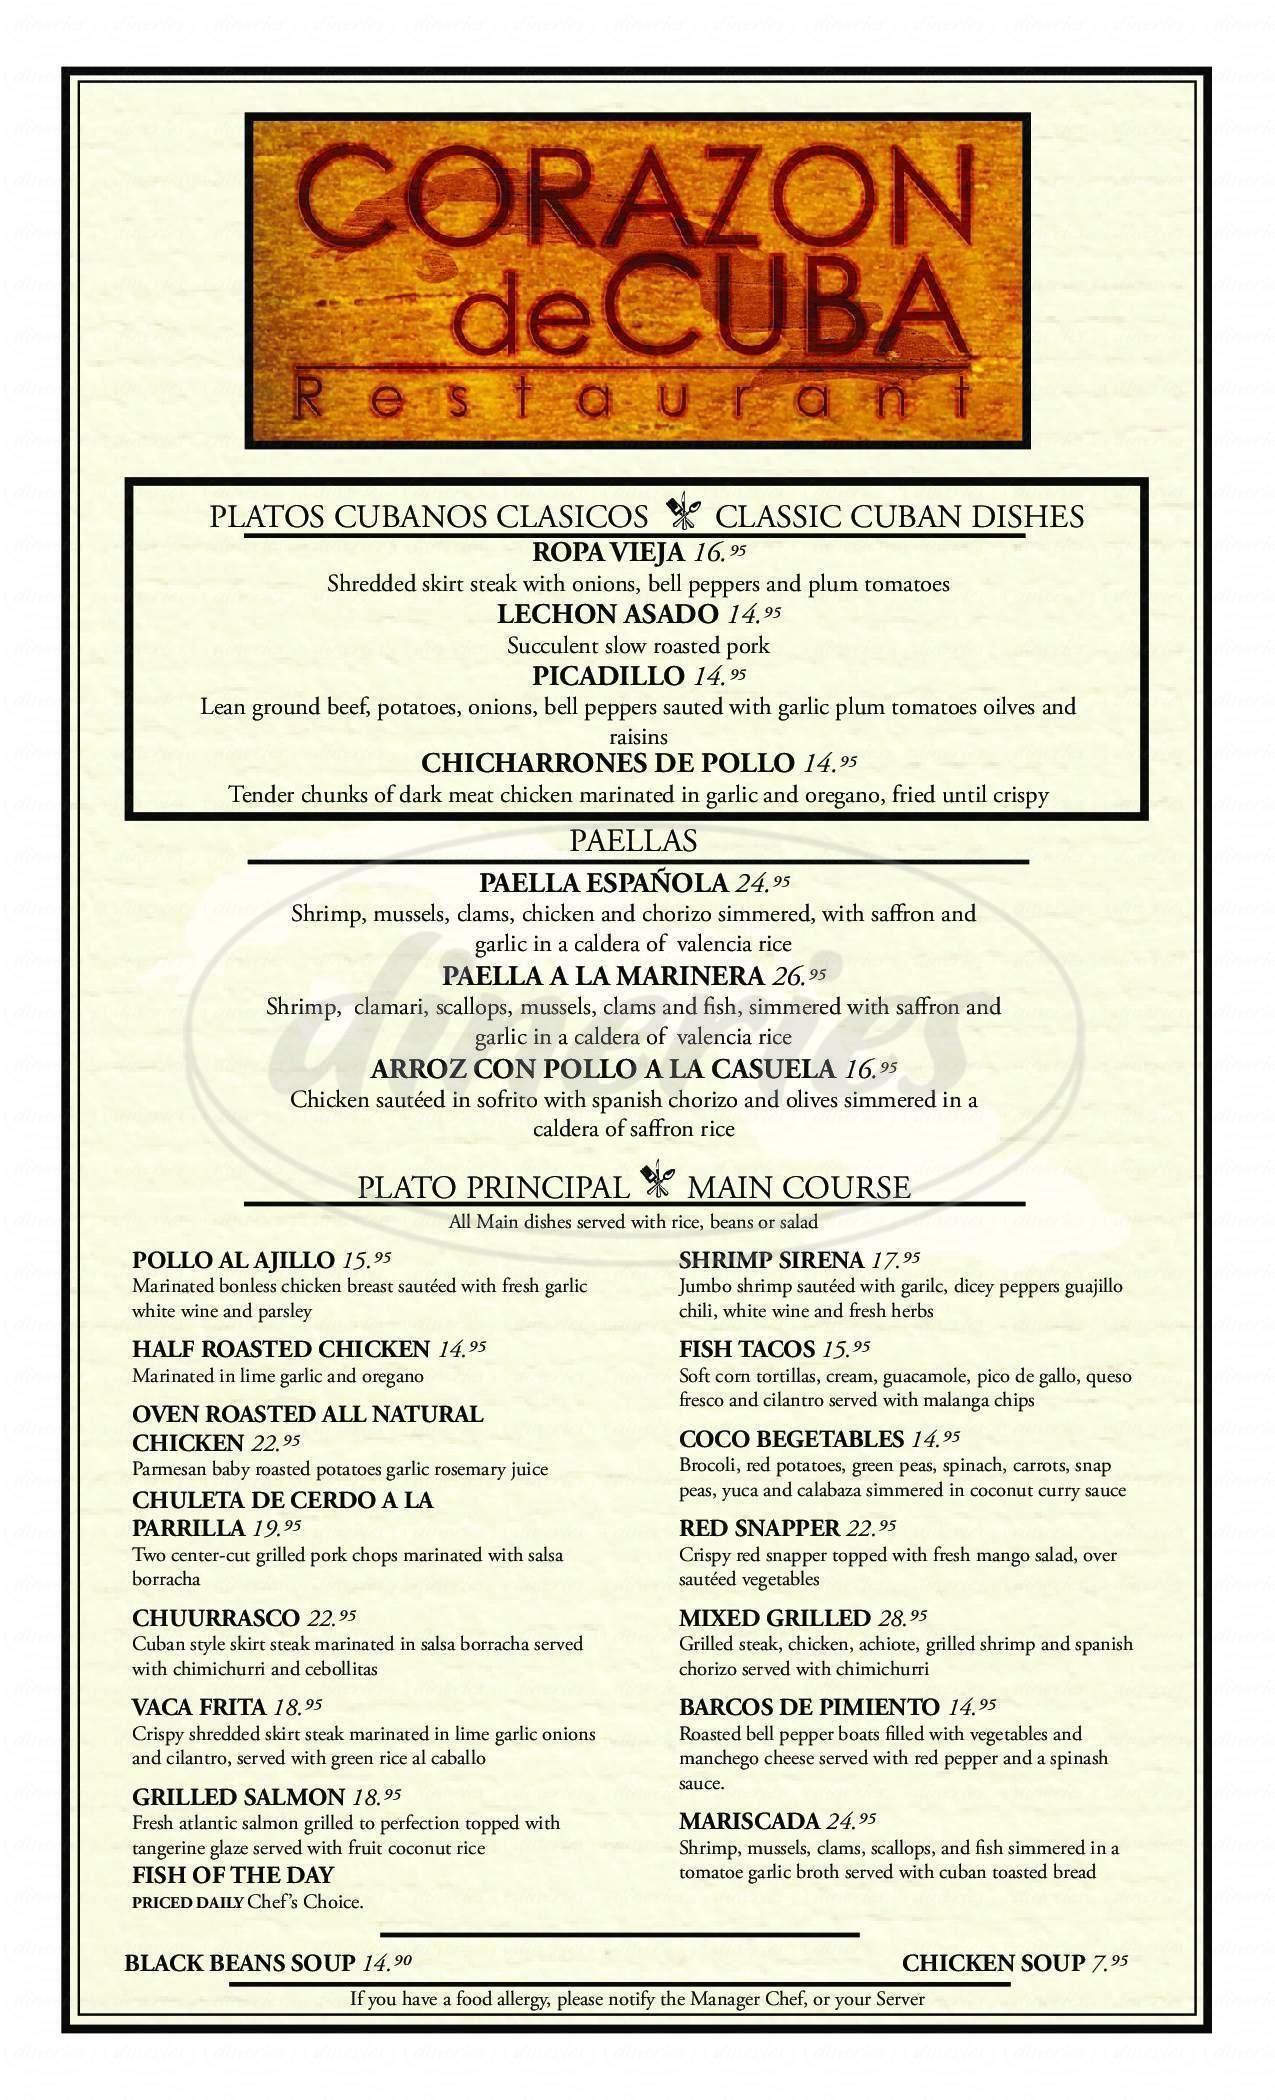 menu for Corazon de Cuba